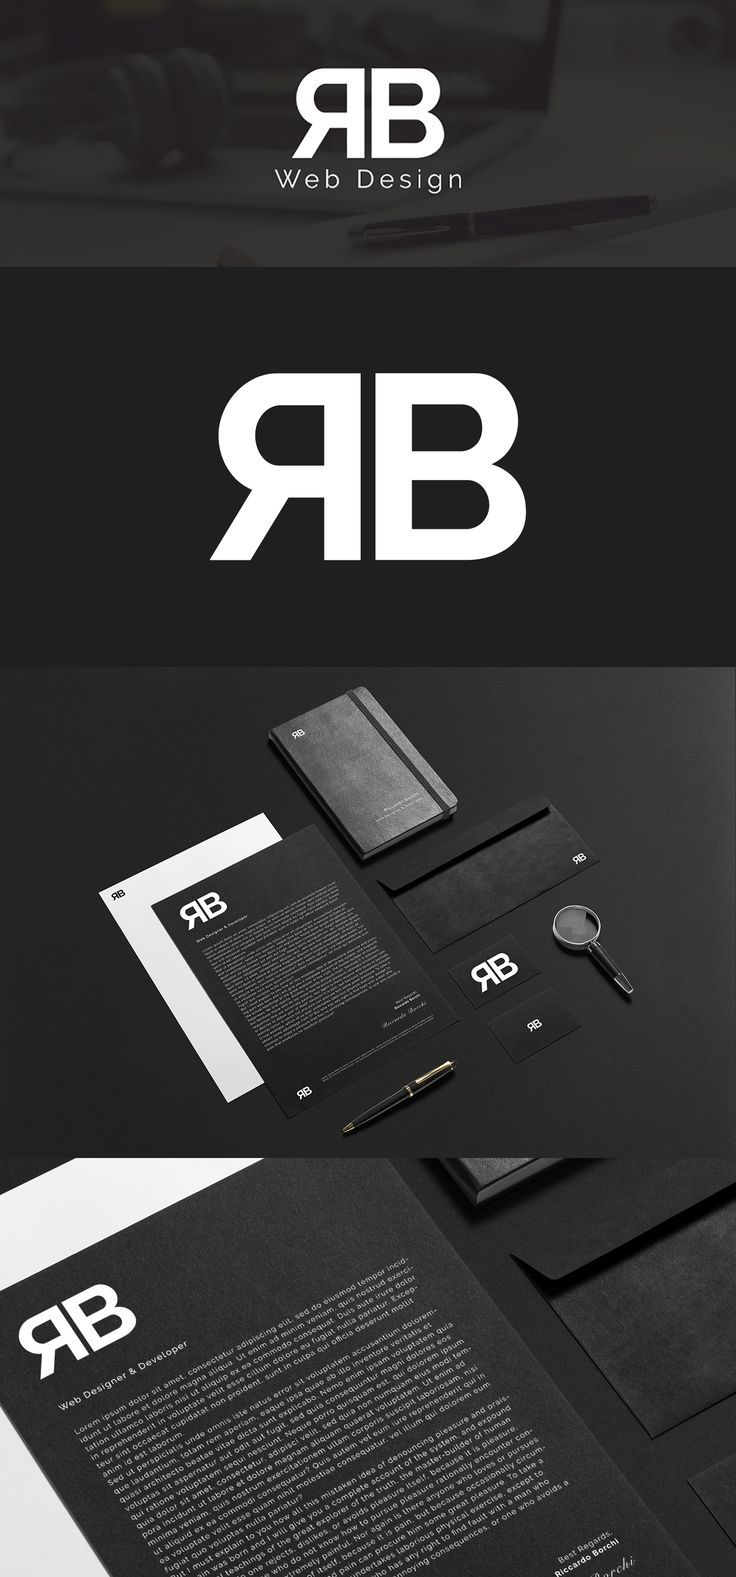 Vedi il mio progetto @Behance: \u201cRB Web Design - Rebrand\u201d https://www.behance.net/gallery/50520529/RB-Web-Design-Rebrand